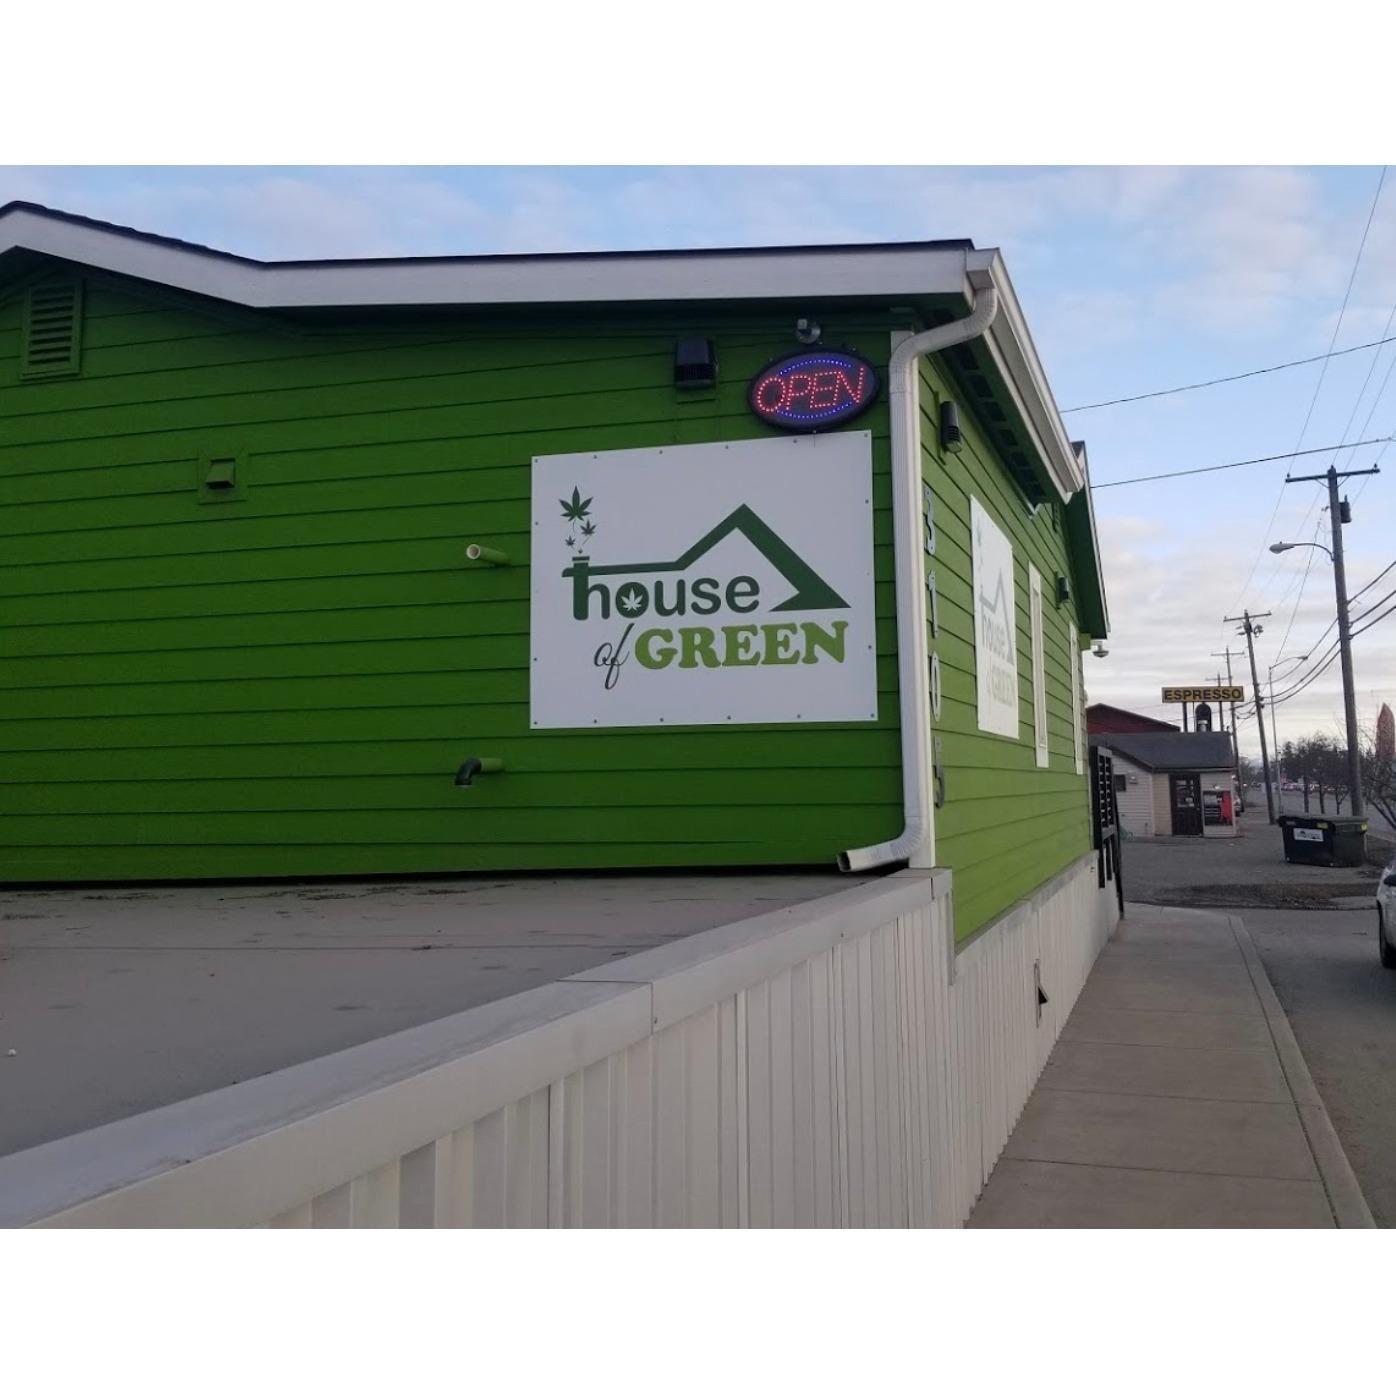 The House of Green Recreational Marijuana Dispensary Anchorage